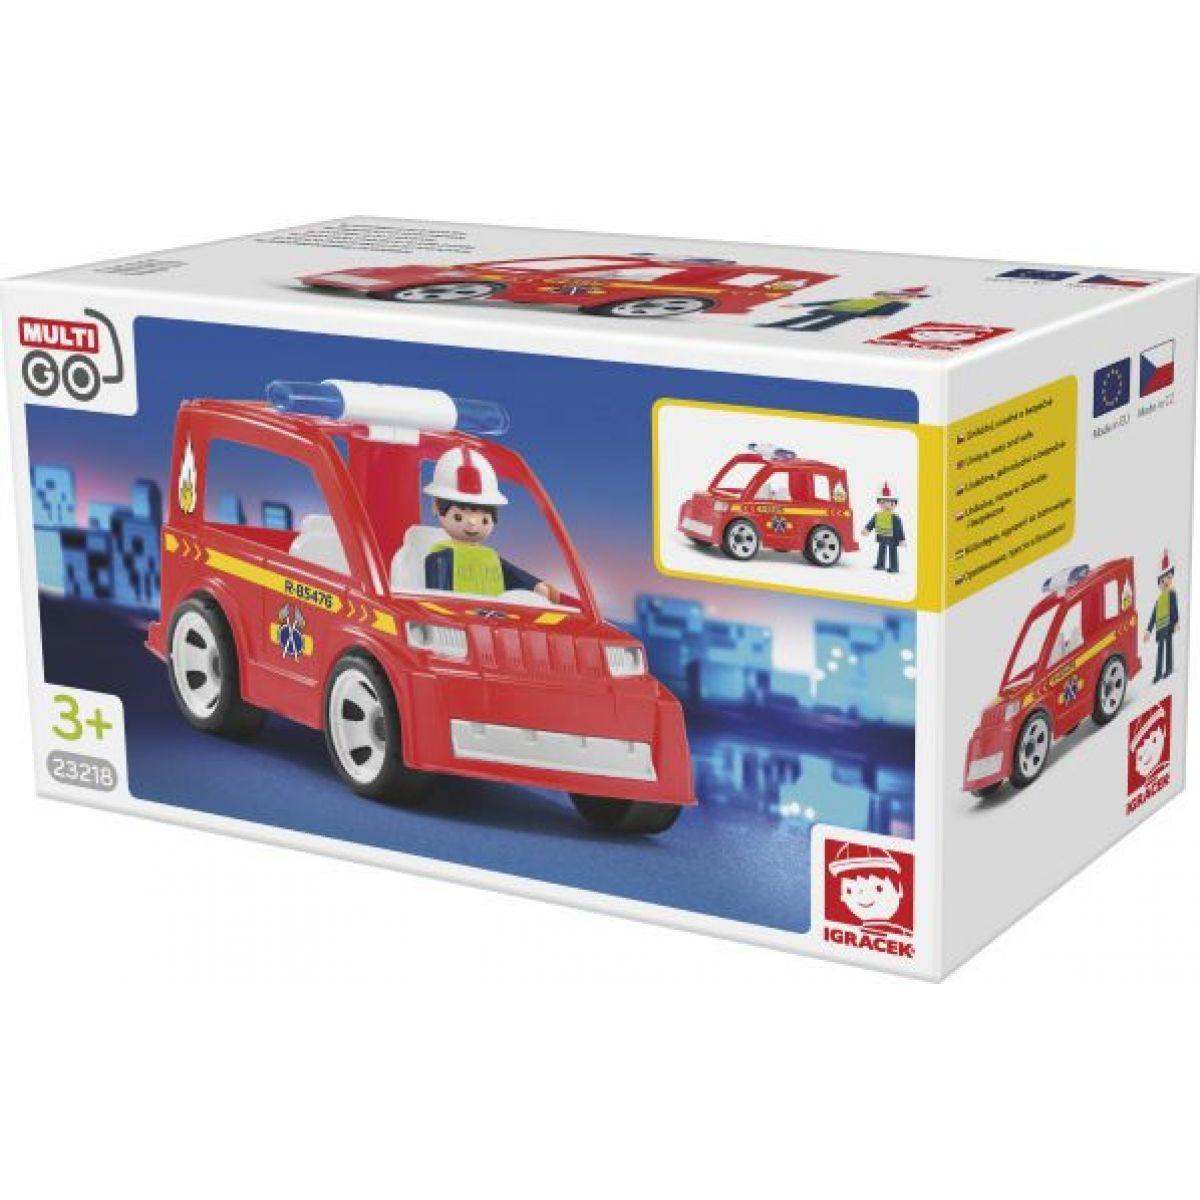 Igráček Hasičské auto s hasičem